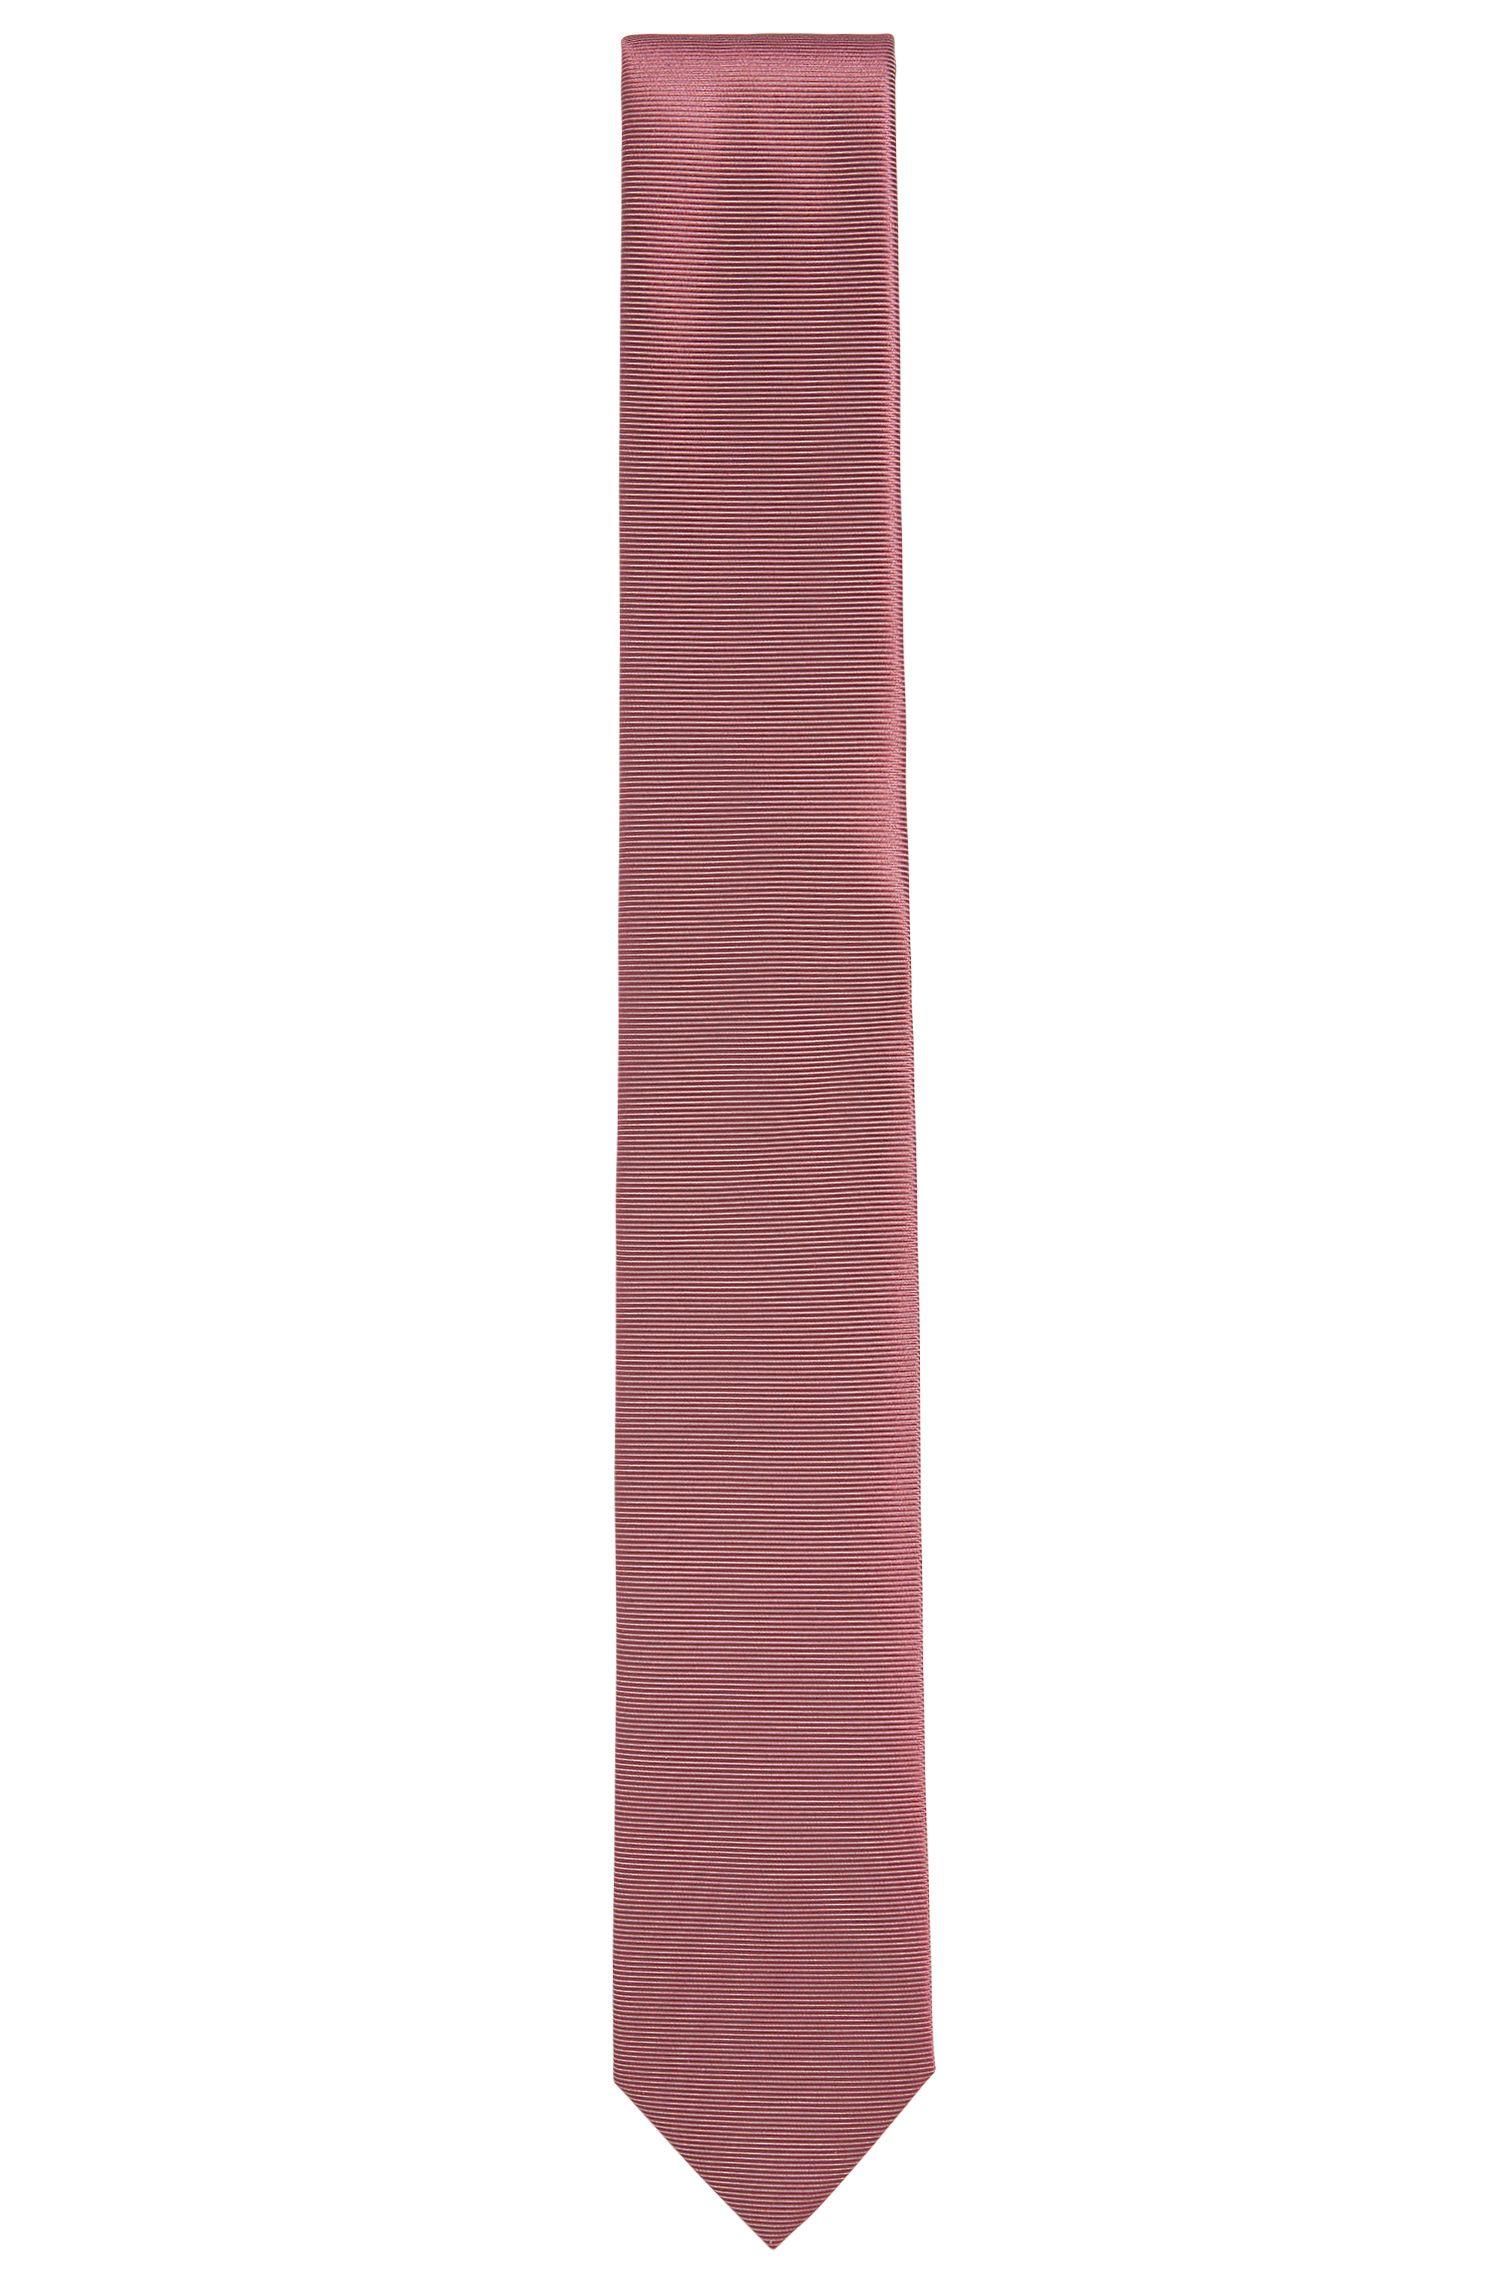 'T-Tie 6 cm'   Slim, Italian Silk Tie